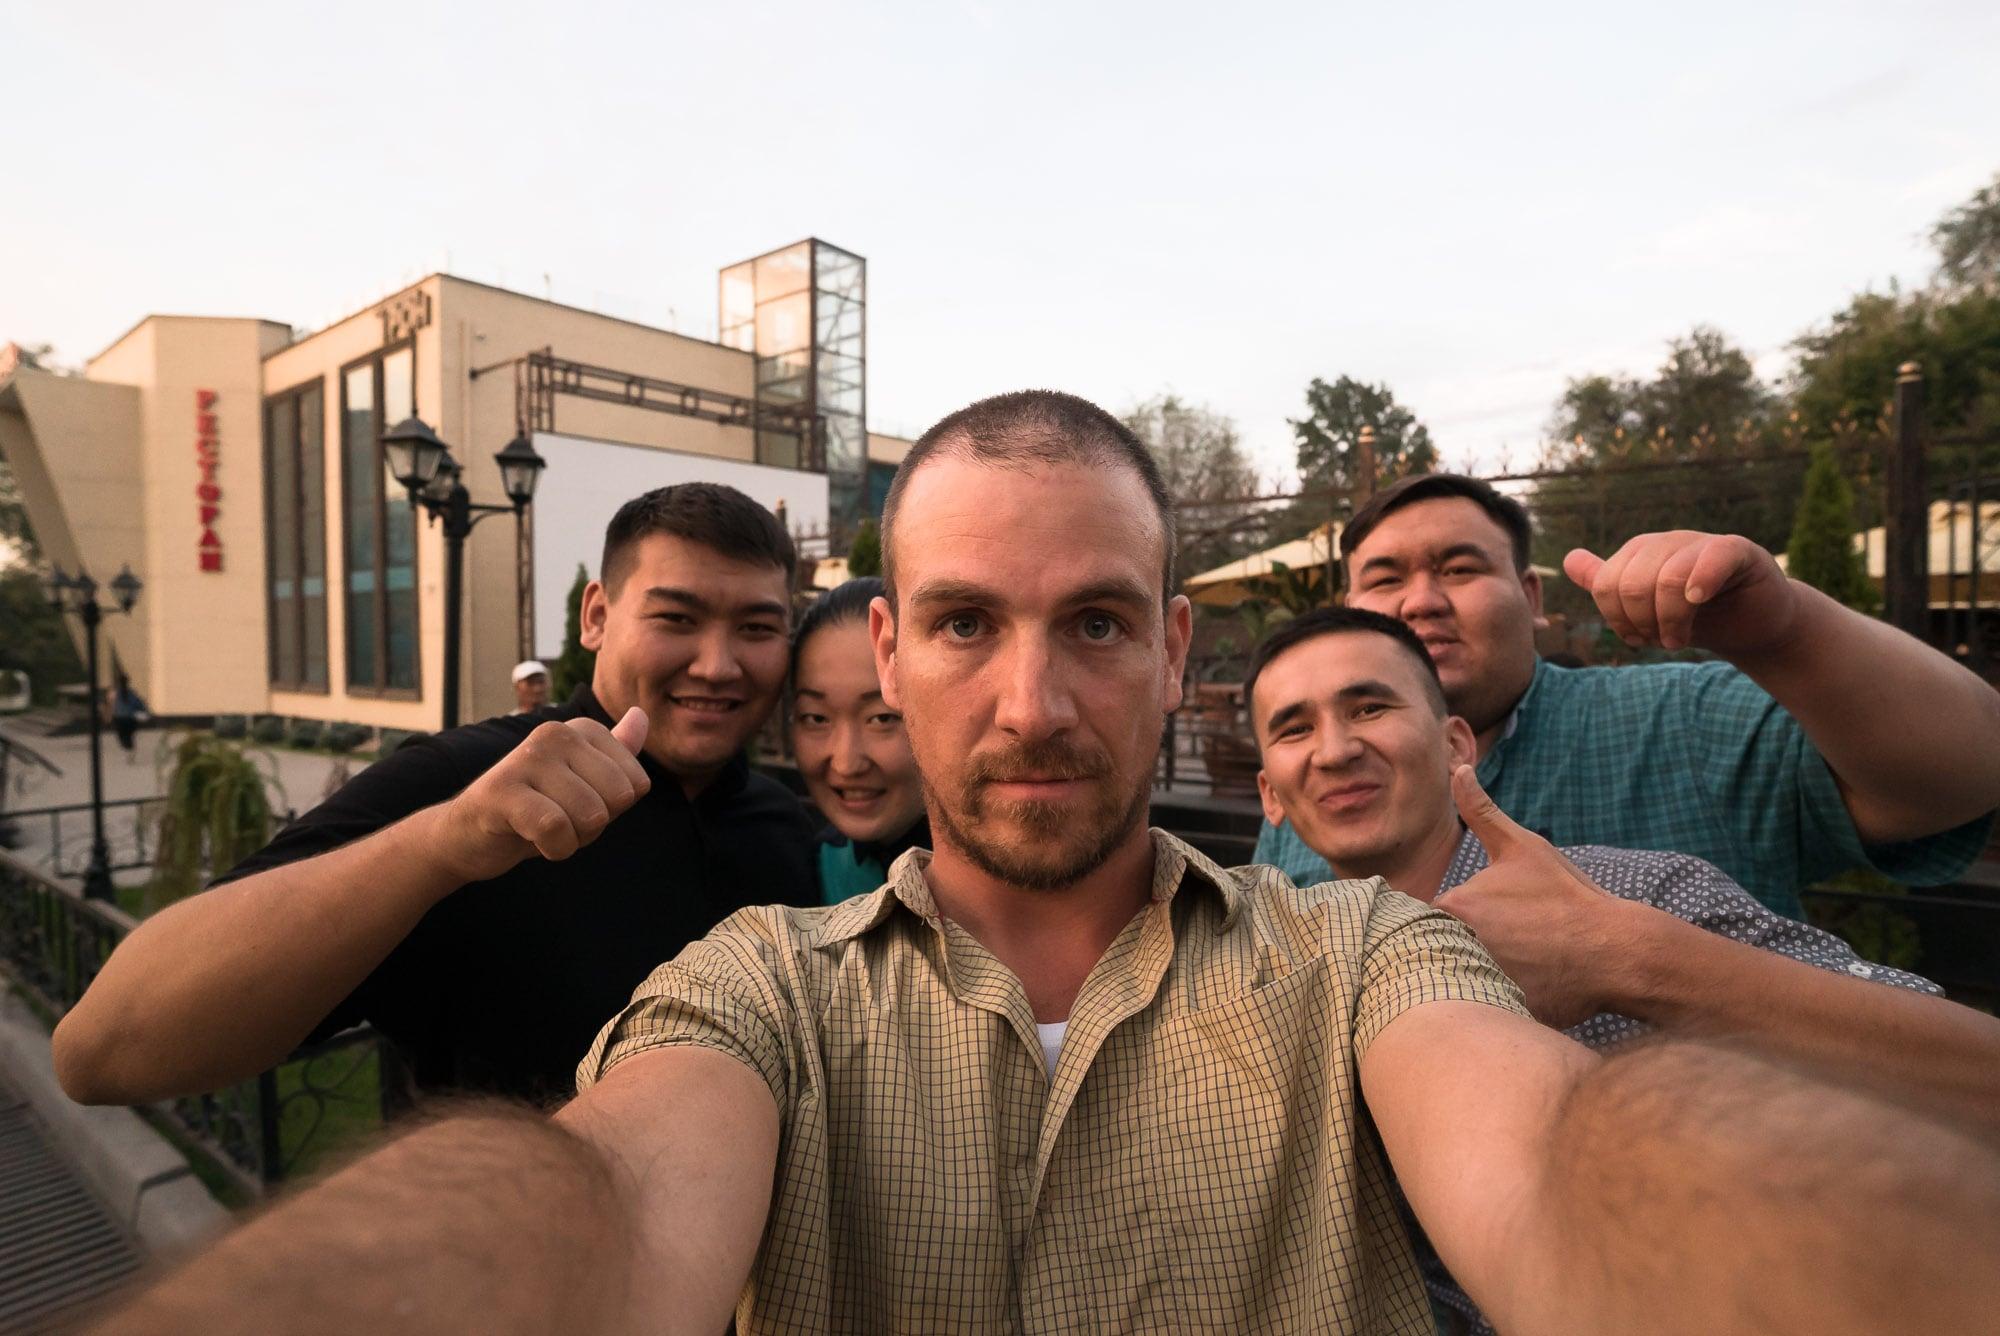 Murat and friends